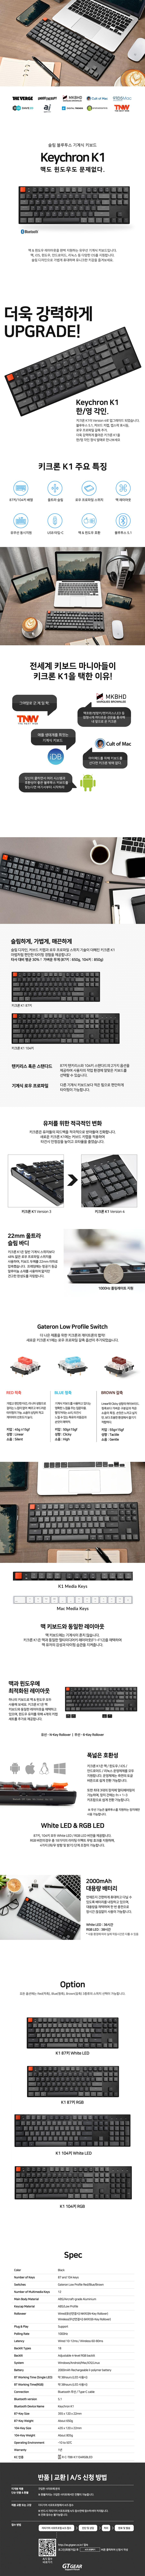 Keychron K1 Version4 텐키리스 WHITE LED (갈축)